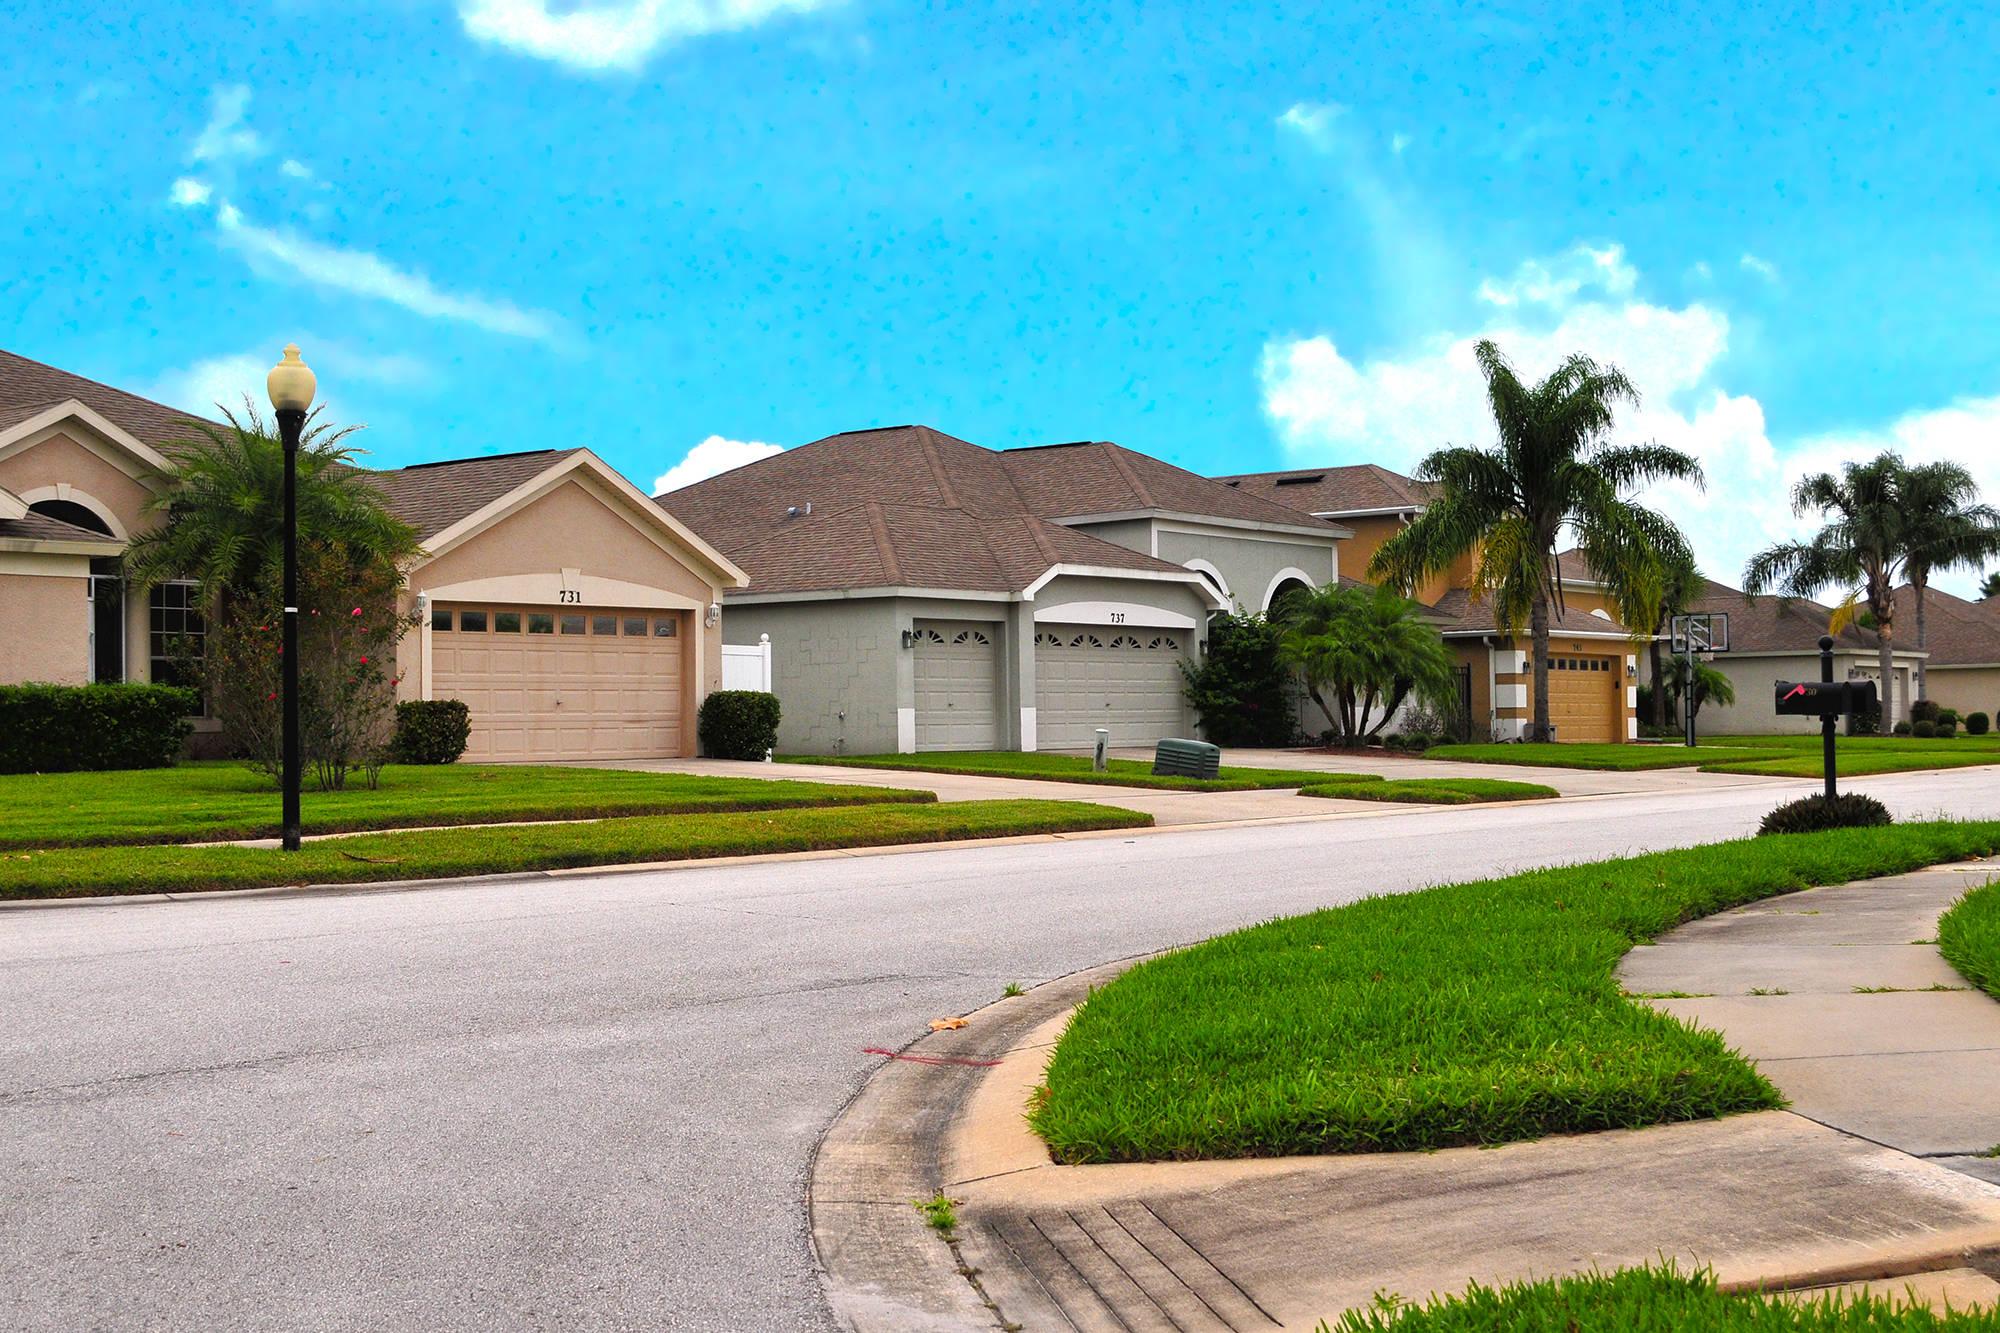 orlando florida real estate foreclosures homes for sale